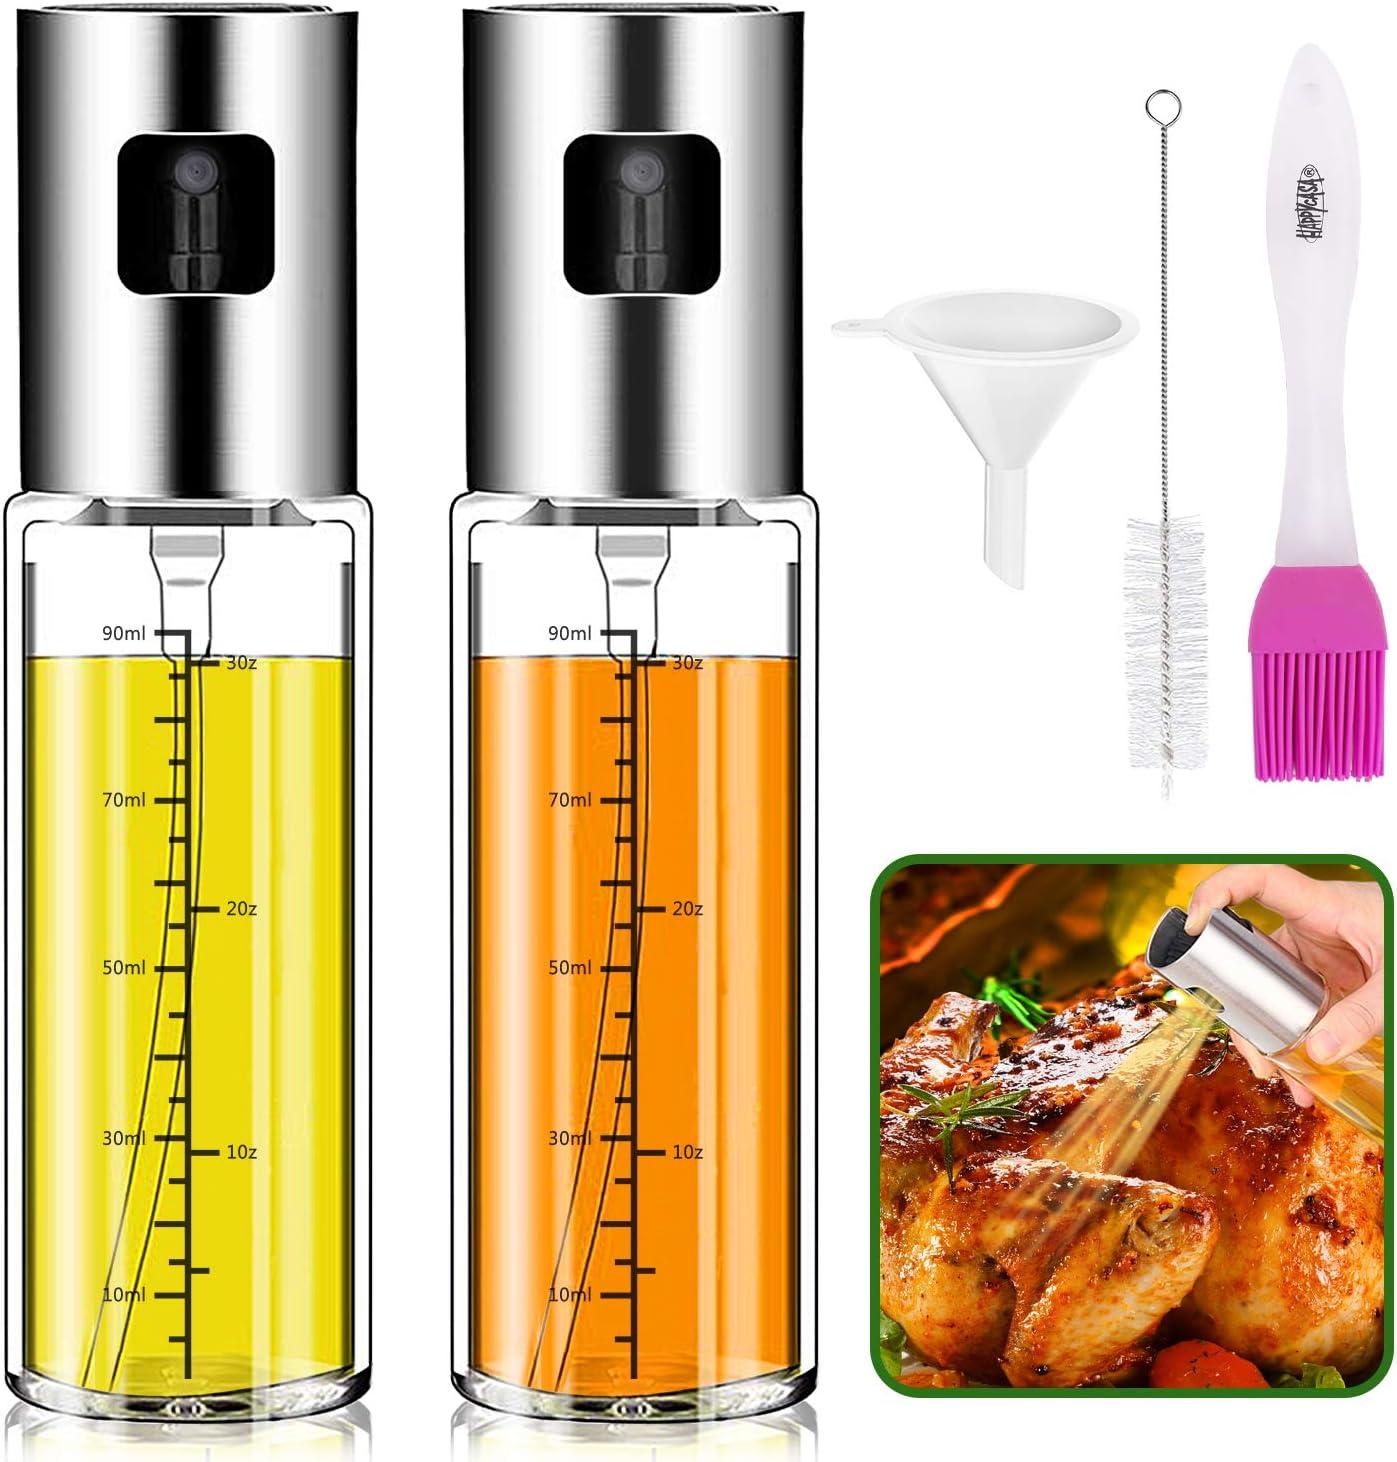 Olive Oil Sprayer for Cooking,Sminder 2pack Oil sprayer Mister for Cook Refillable Oil and Vinegar Dispenser Glass Bottle with Measurements for BBQ Baking Roasting Frying Oil Control Diet 100ml